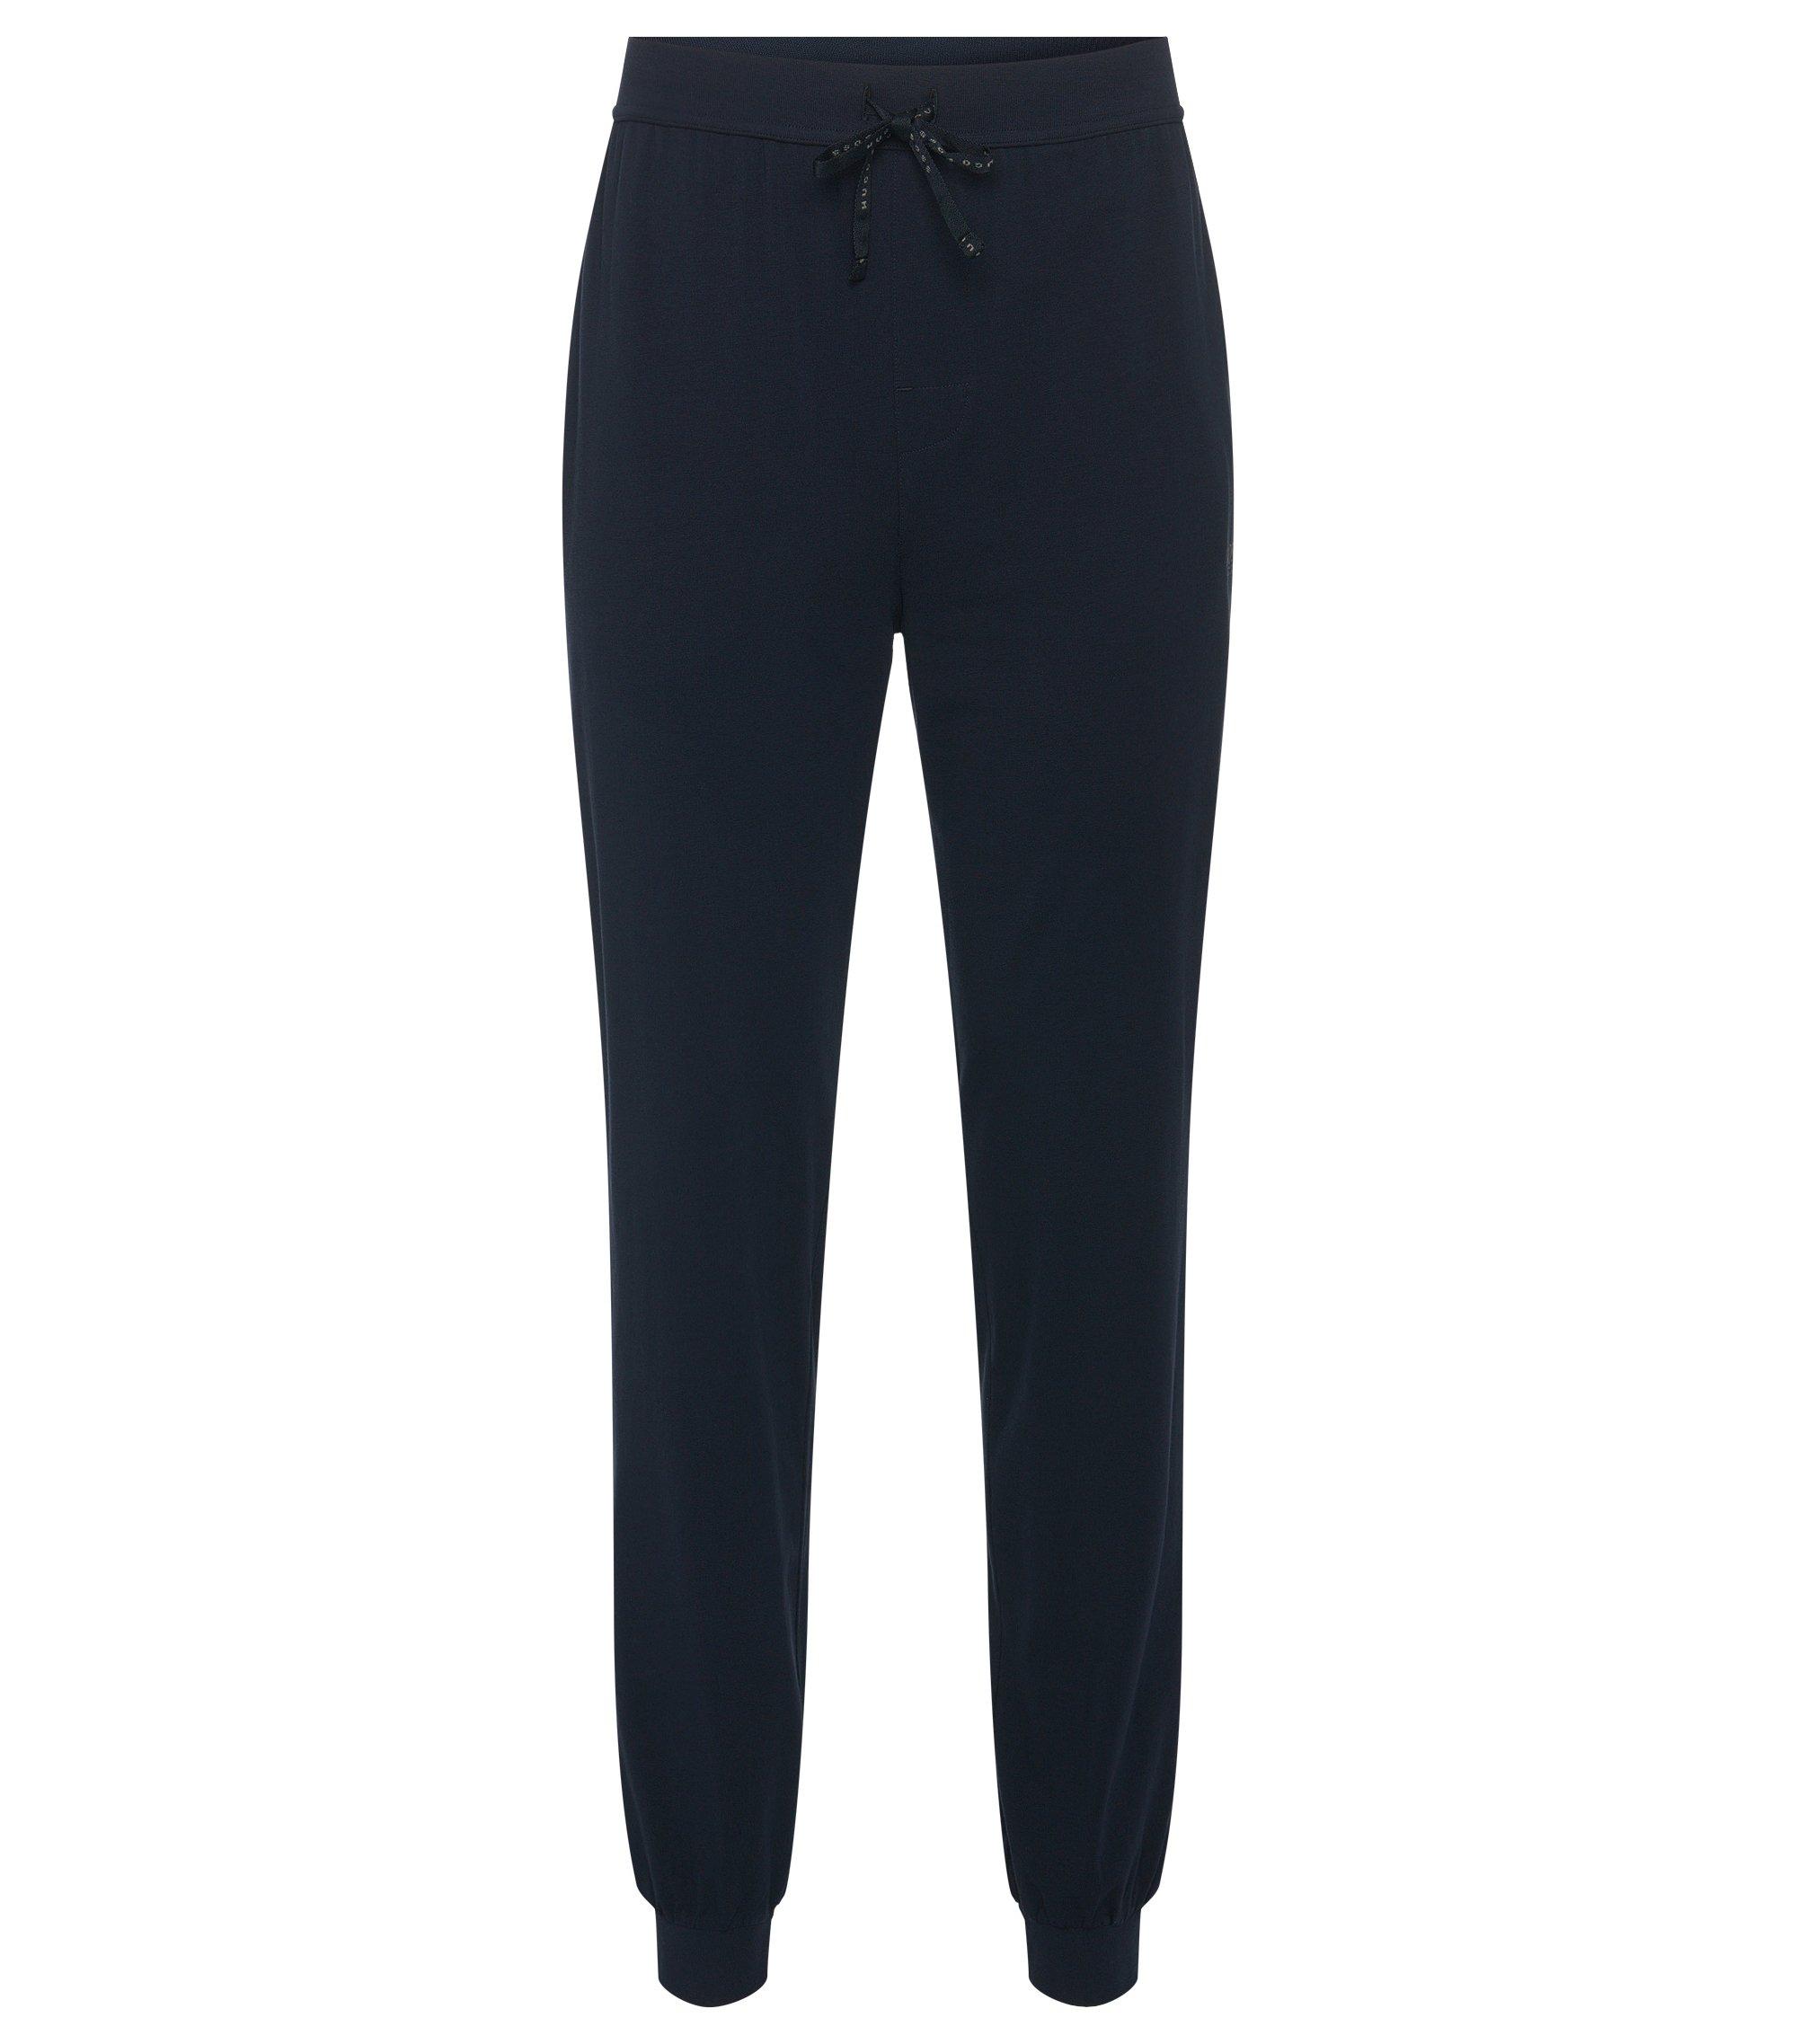 Sweatbroek van stretchkatoen met tunnelkoord: 'Long Pant CW Cuffs', Donkerblauw